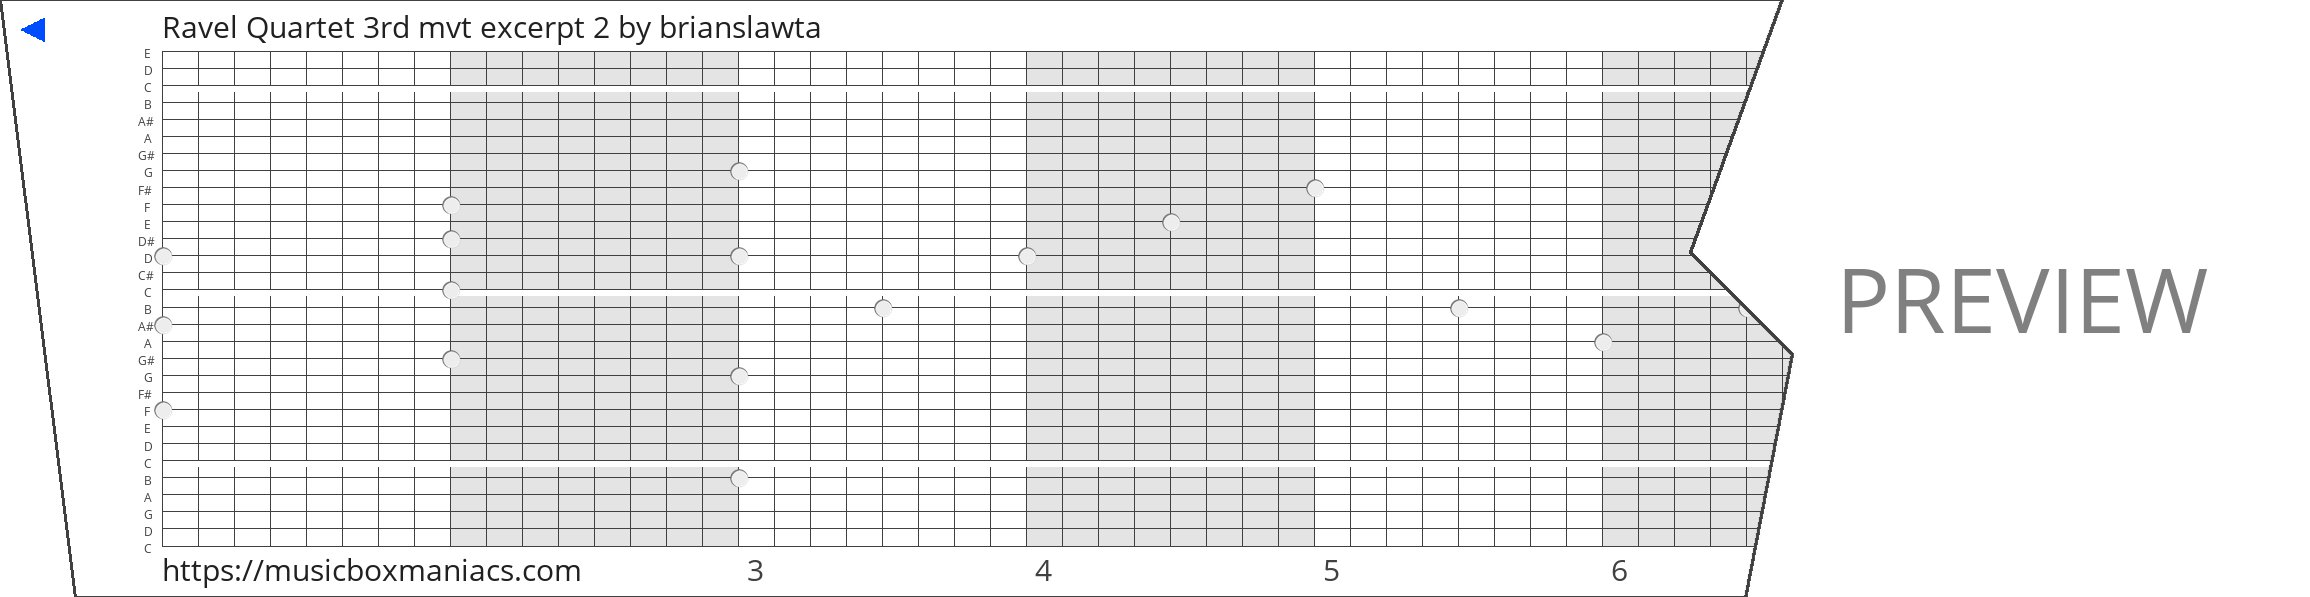 Ravel Quartet 3rd mvt excerpt 2 30 note music box paper strip